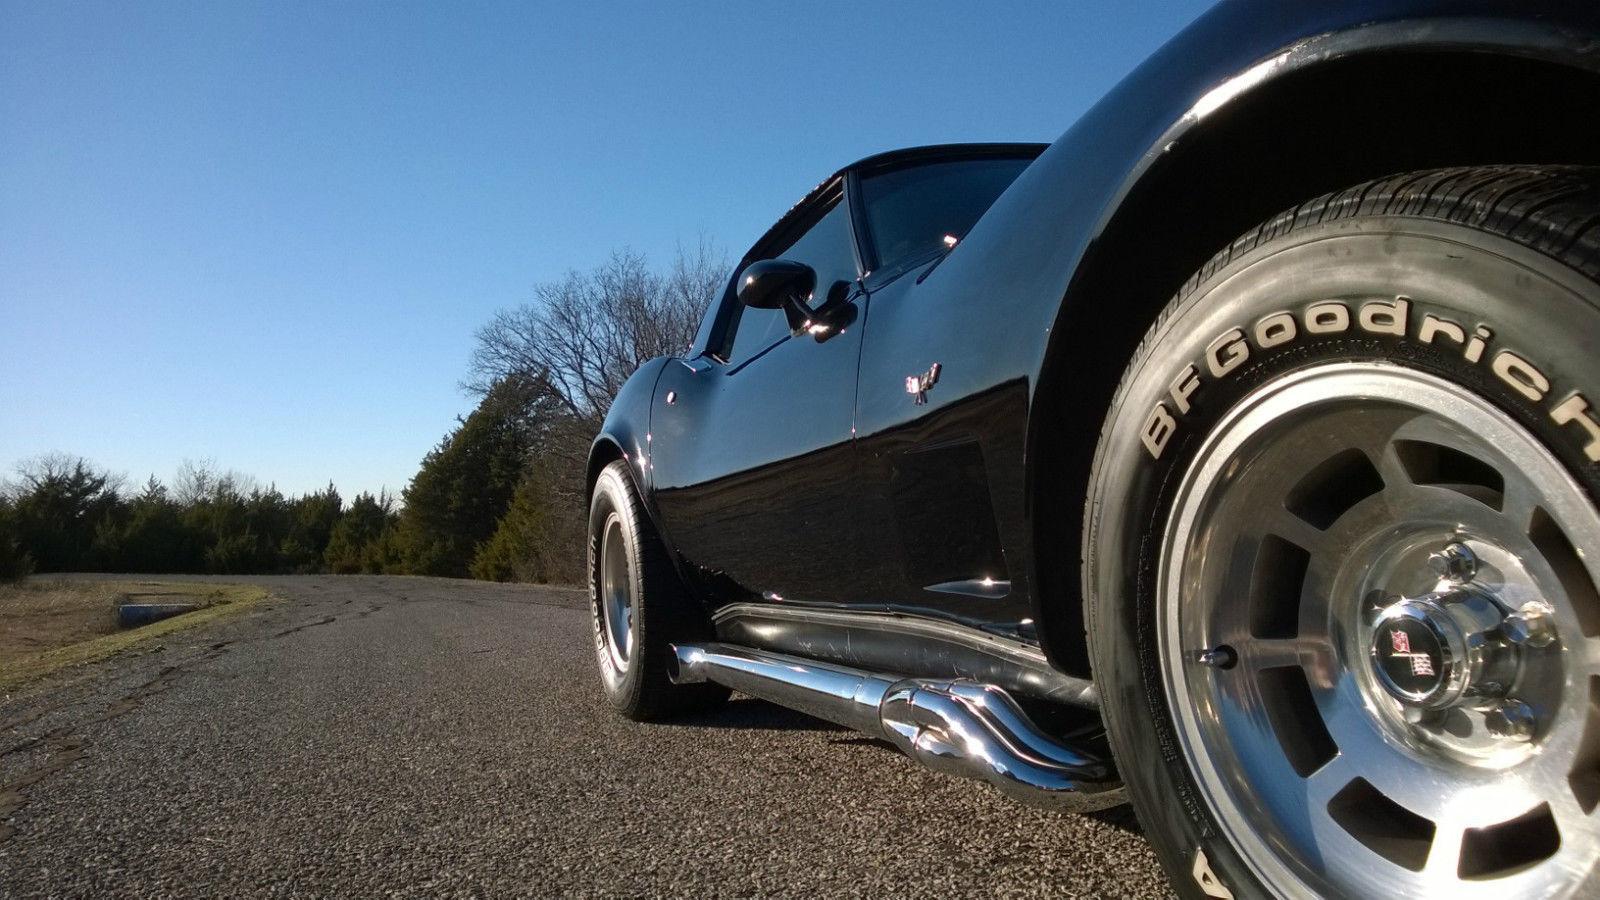 1979 Corvette Black On Black With Chrome Sidepipes